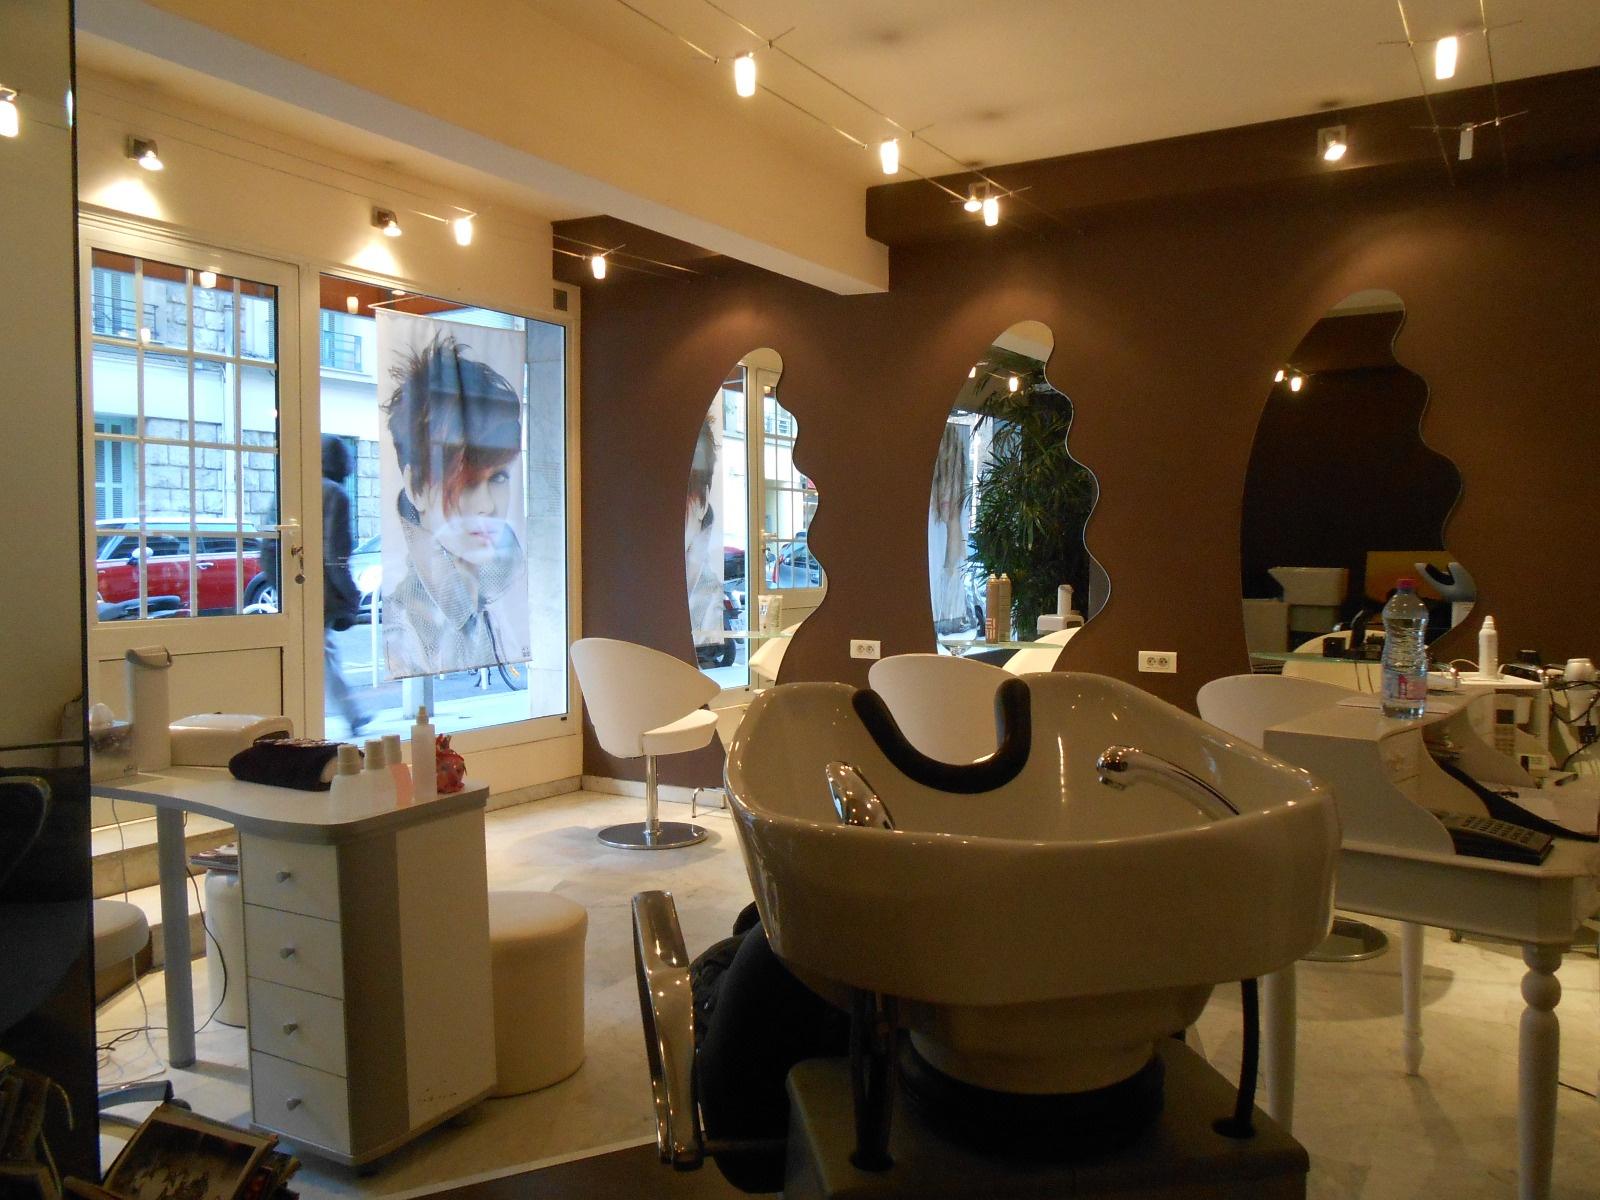 Salons de coiffure nice coiffures la mode de la saison for Salon de coiffure original